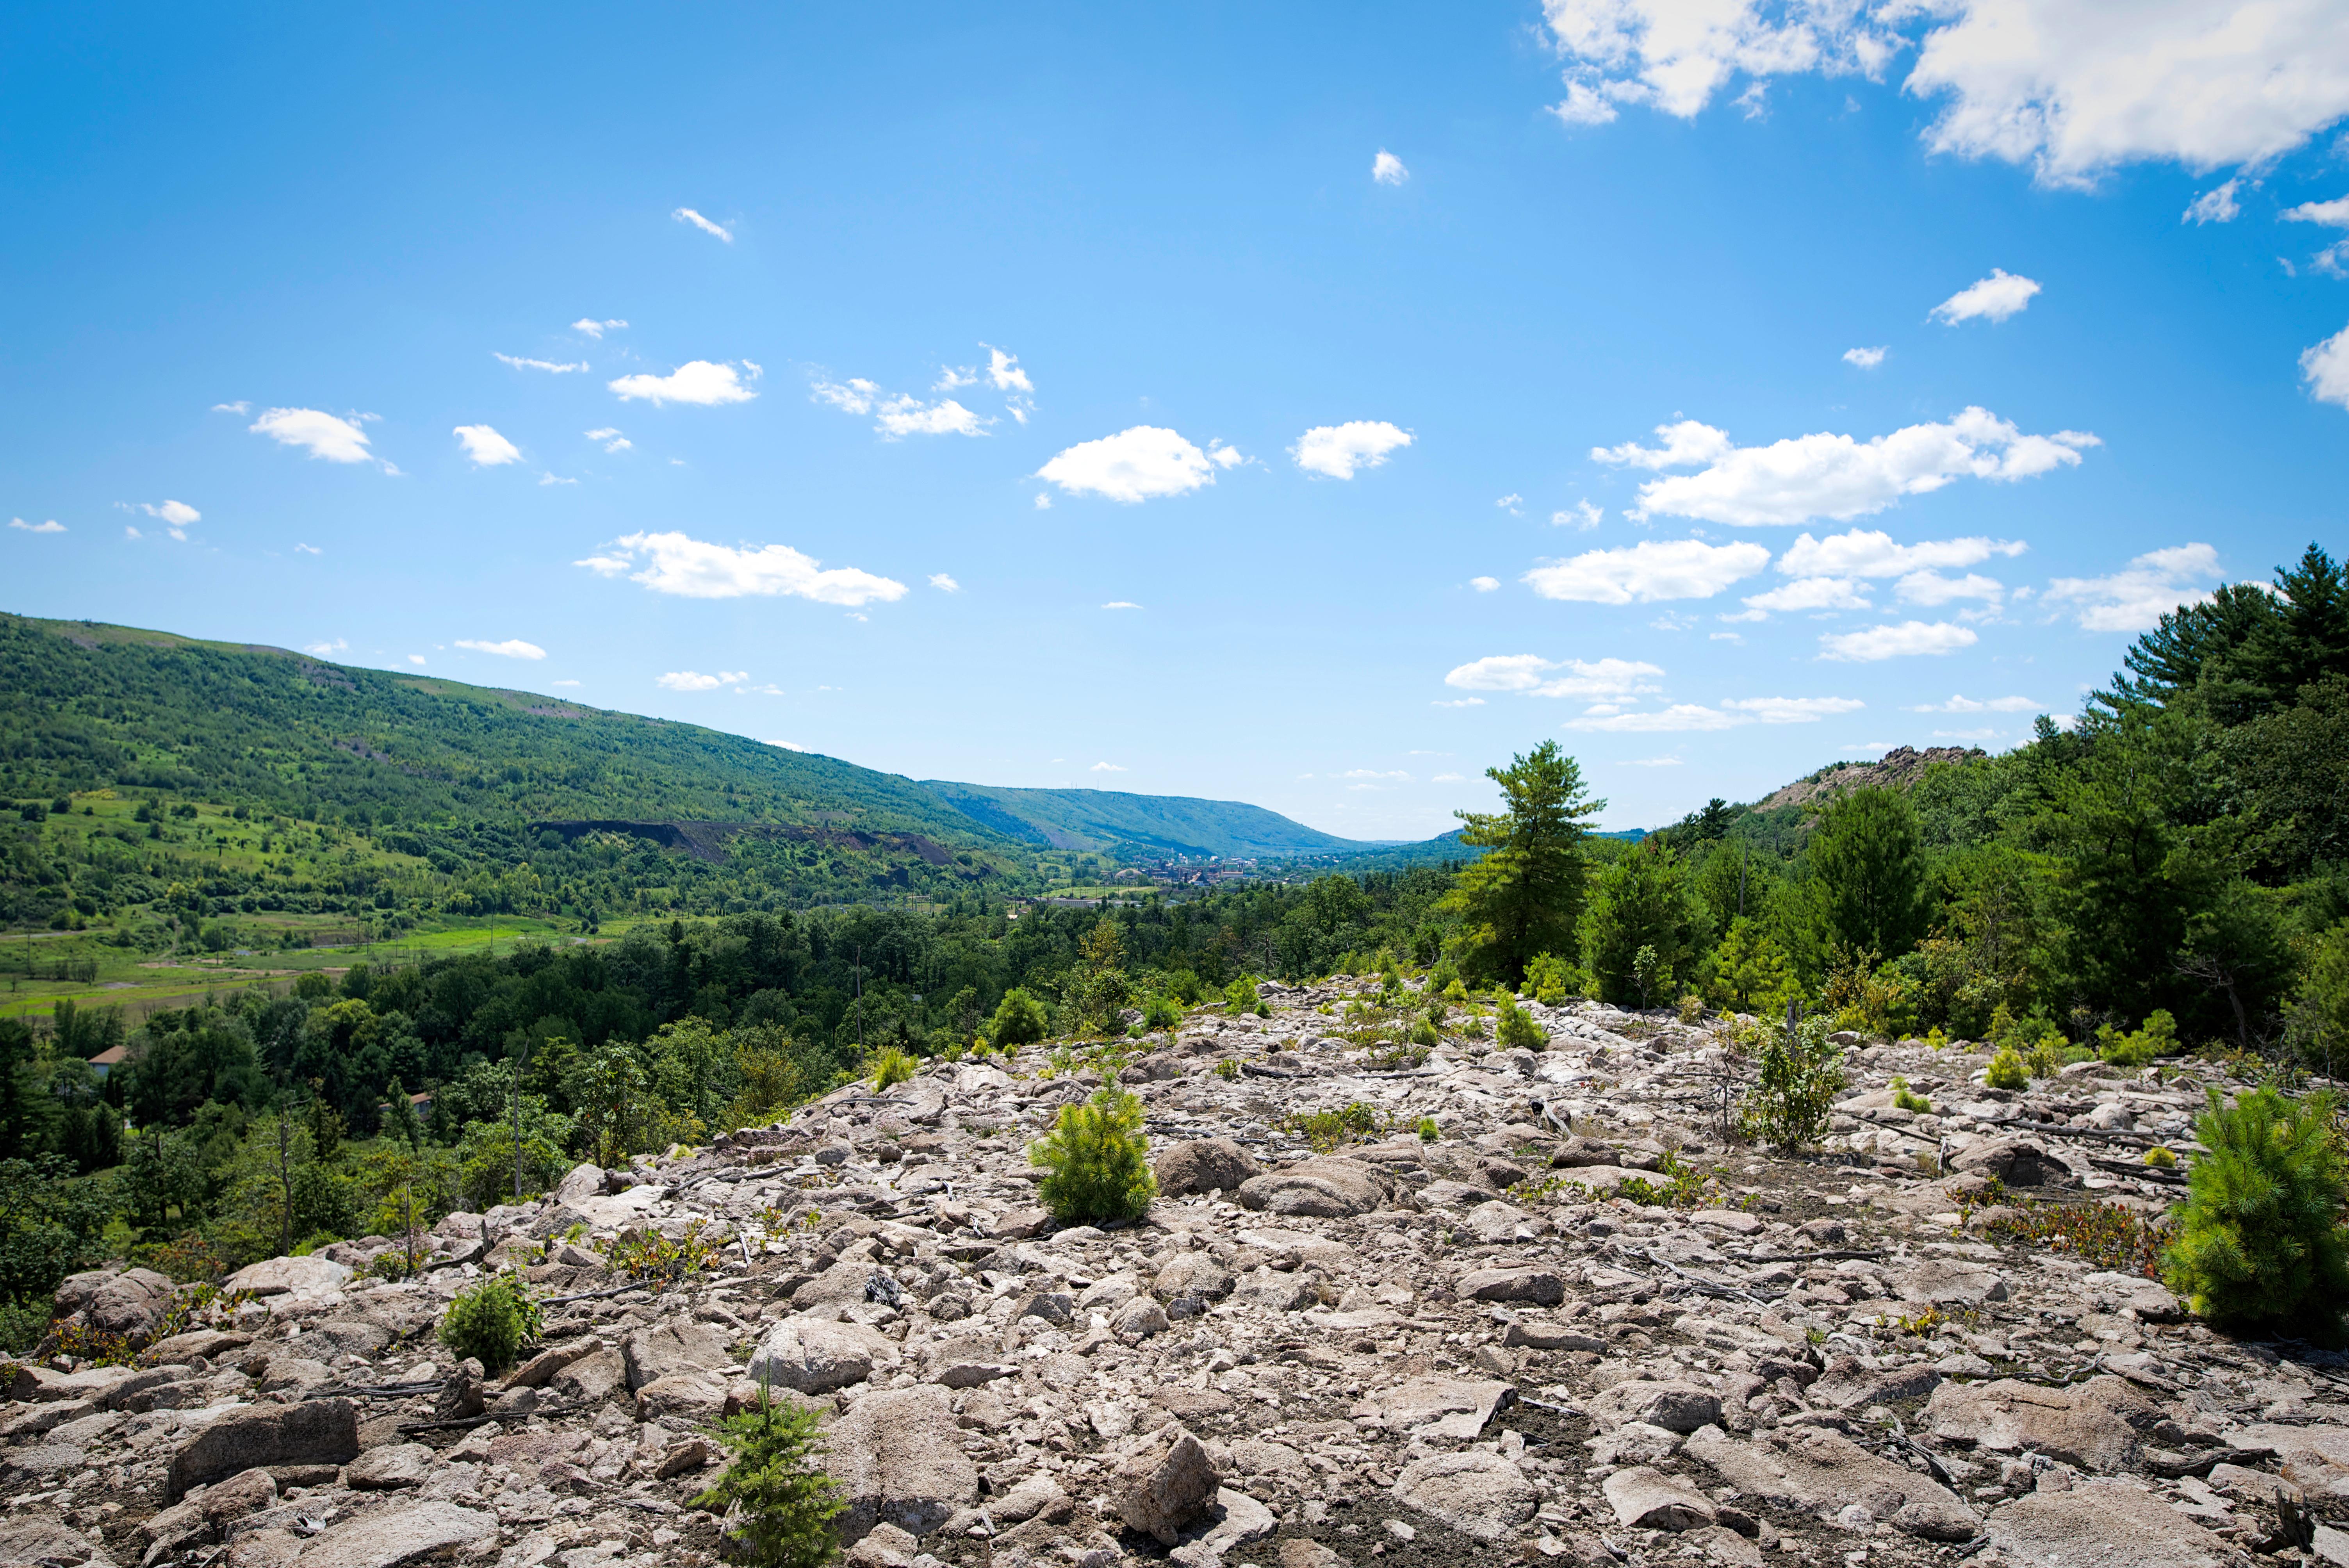 View along Kittatinny Ridge